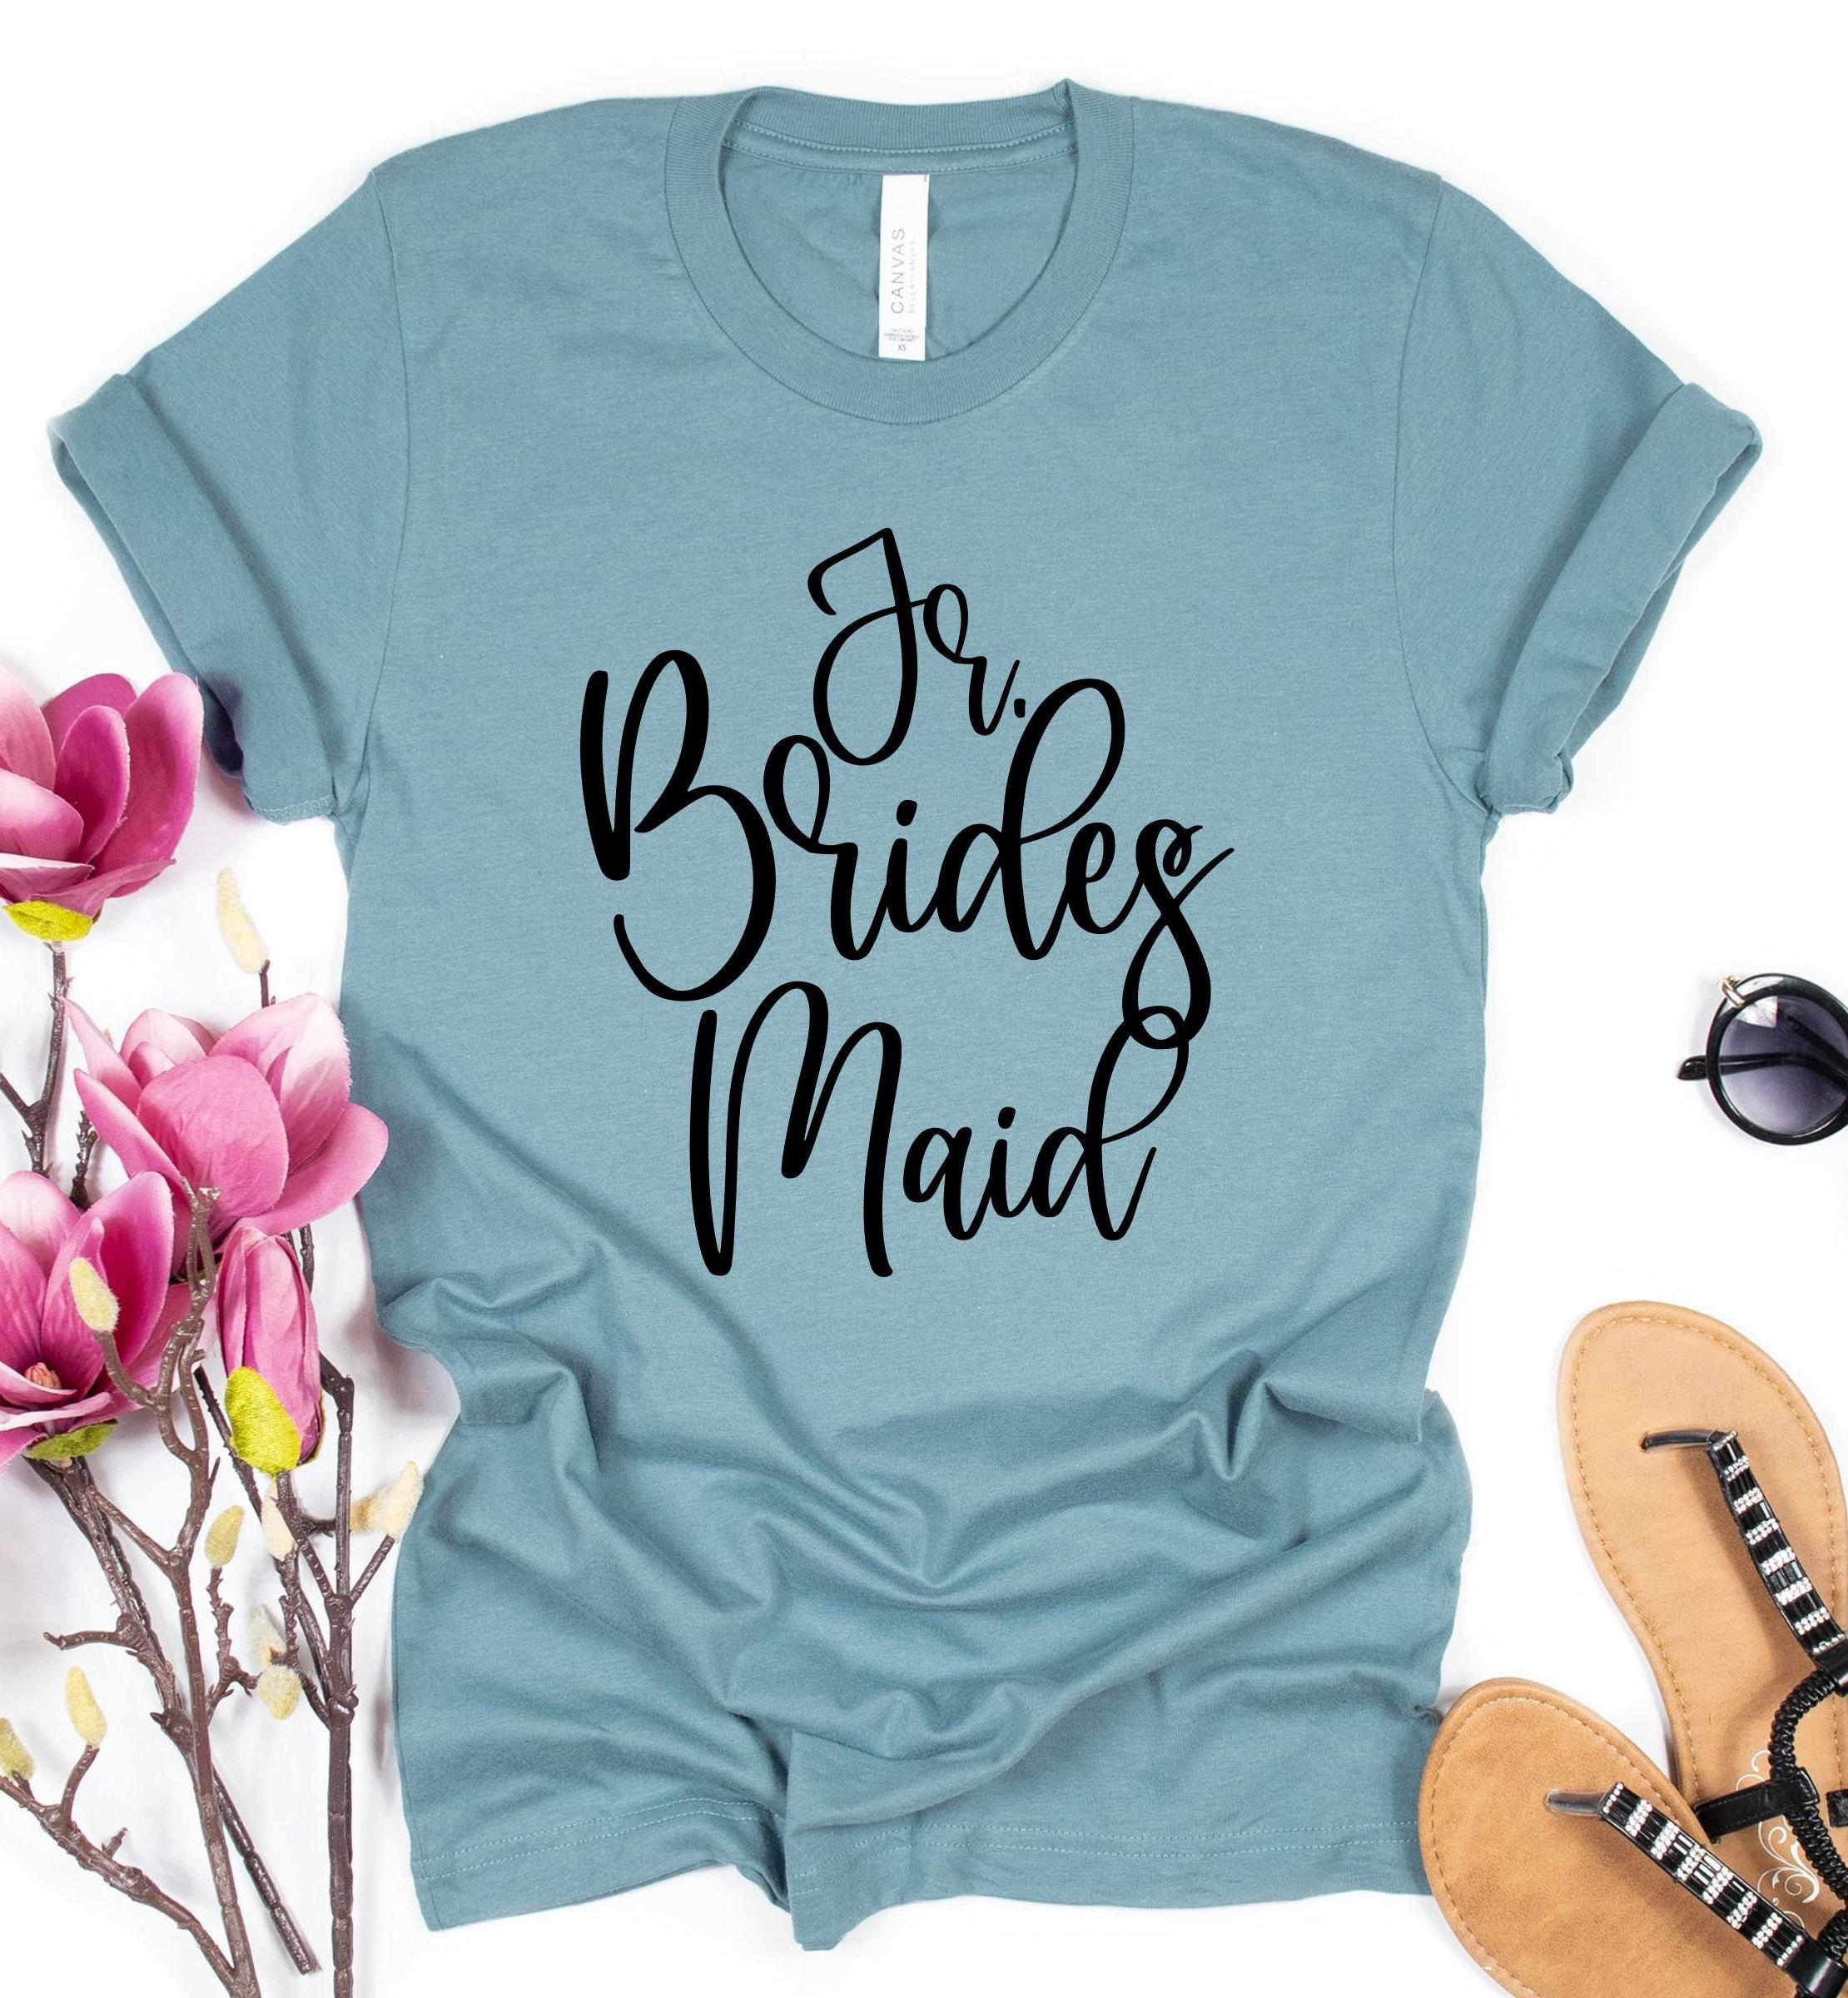 Jr-bridesmaid-svg-jr-bride-svg-bridesmaid-svg-bridal-party-svg-wedding-svg-design-bachelorette-svg-design-bridesmaid-cricut-svg-600a1557